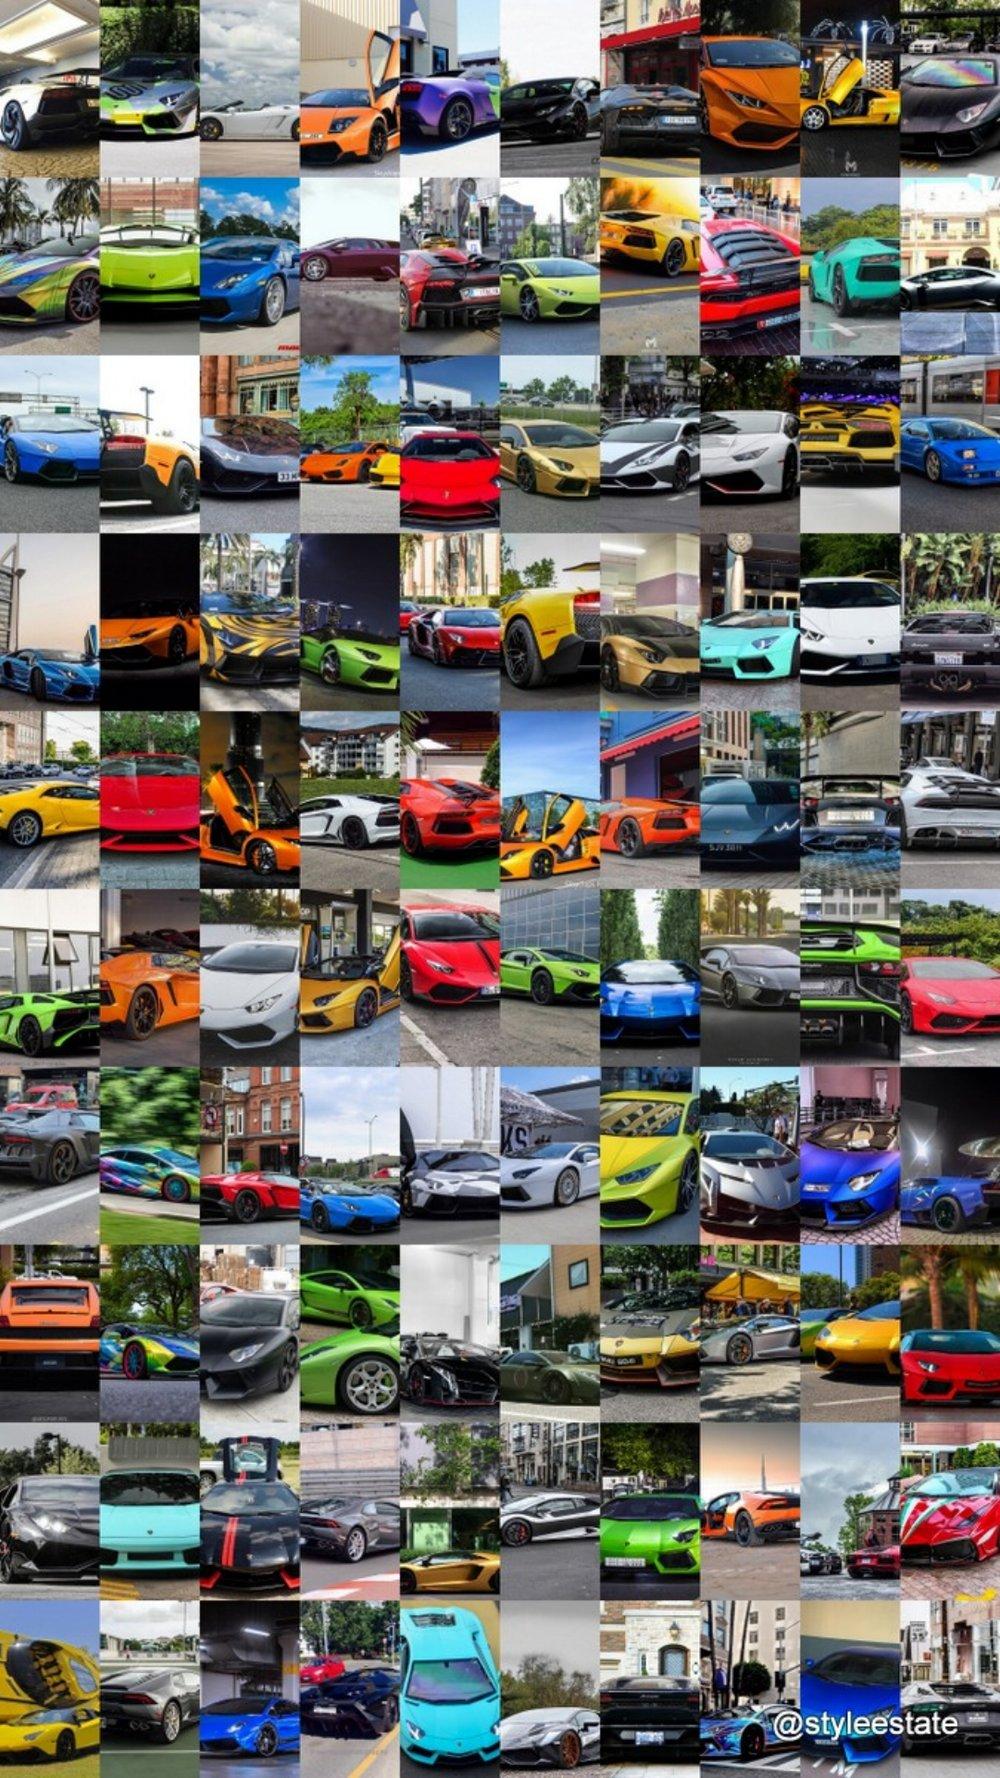 100 Insane Lamborghini Supercars From Instagram